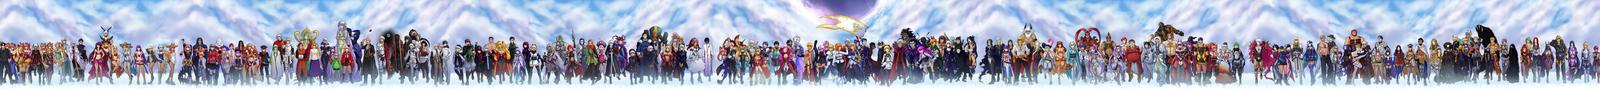 Throne of Heroes